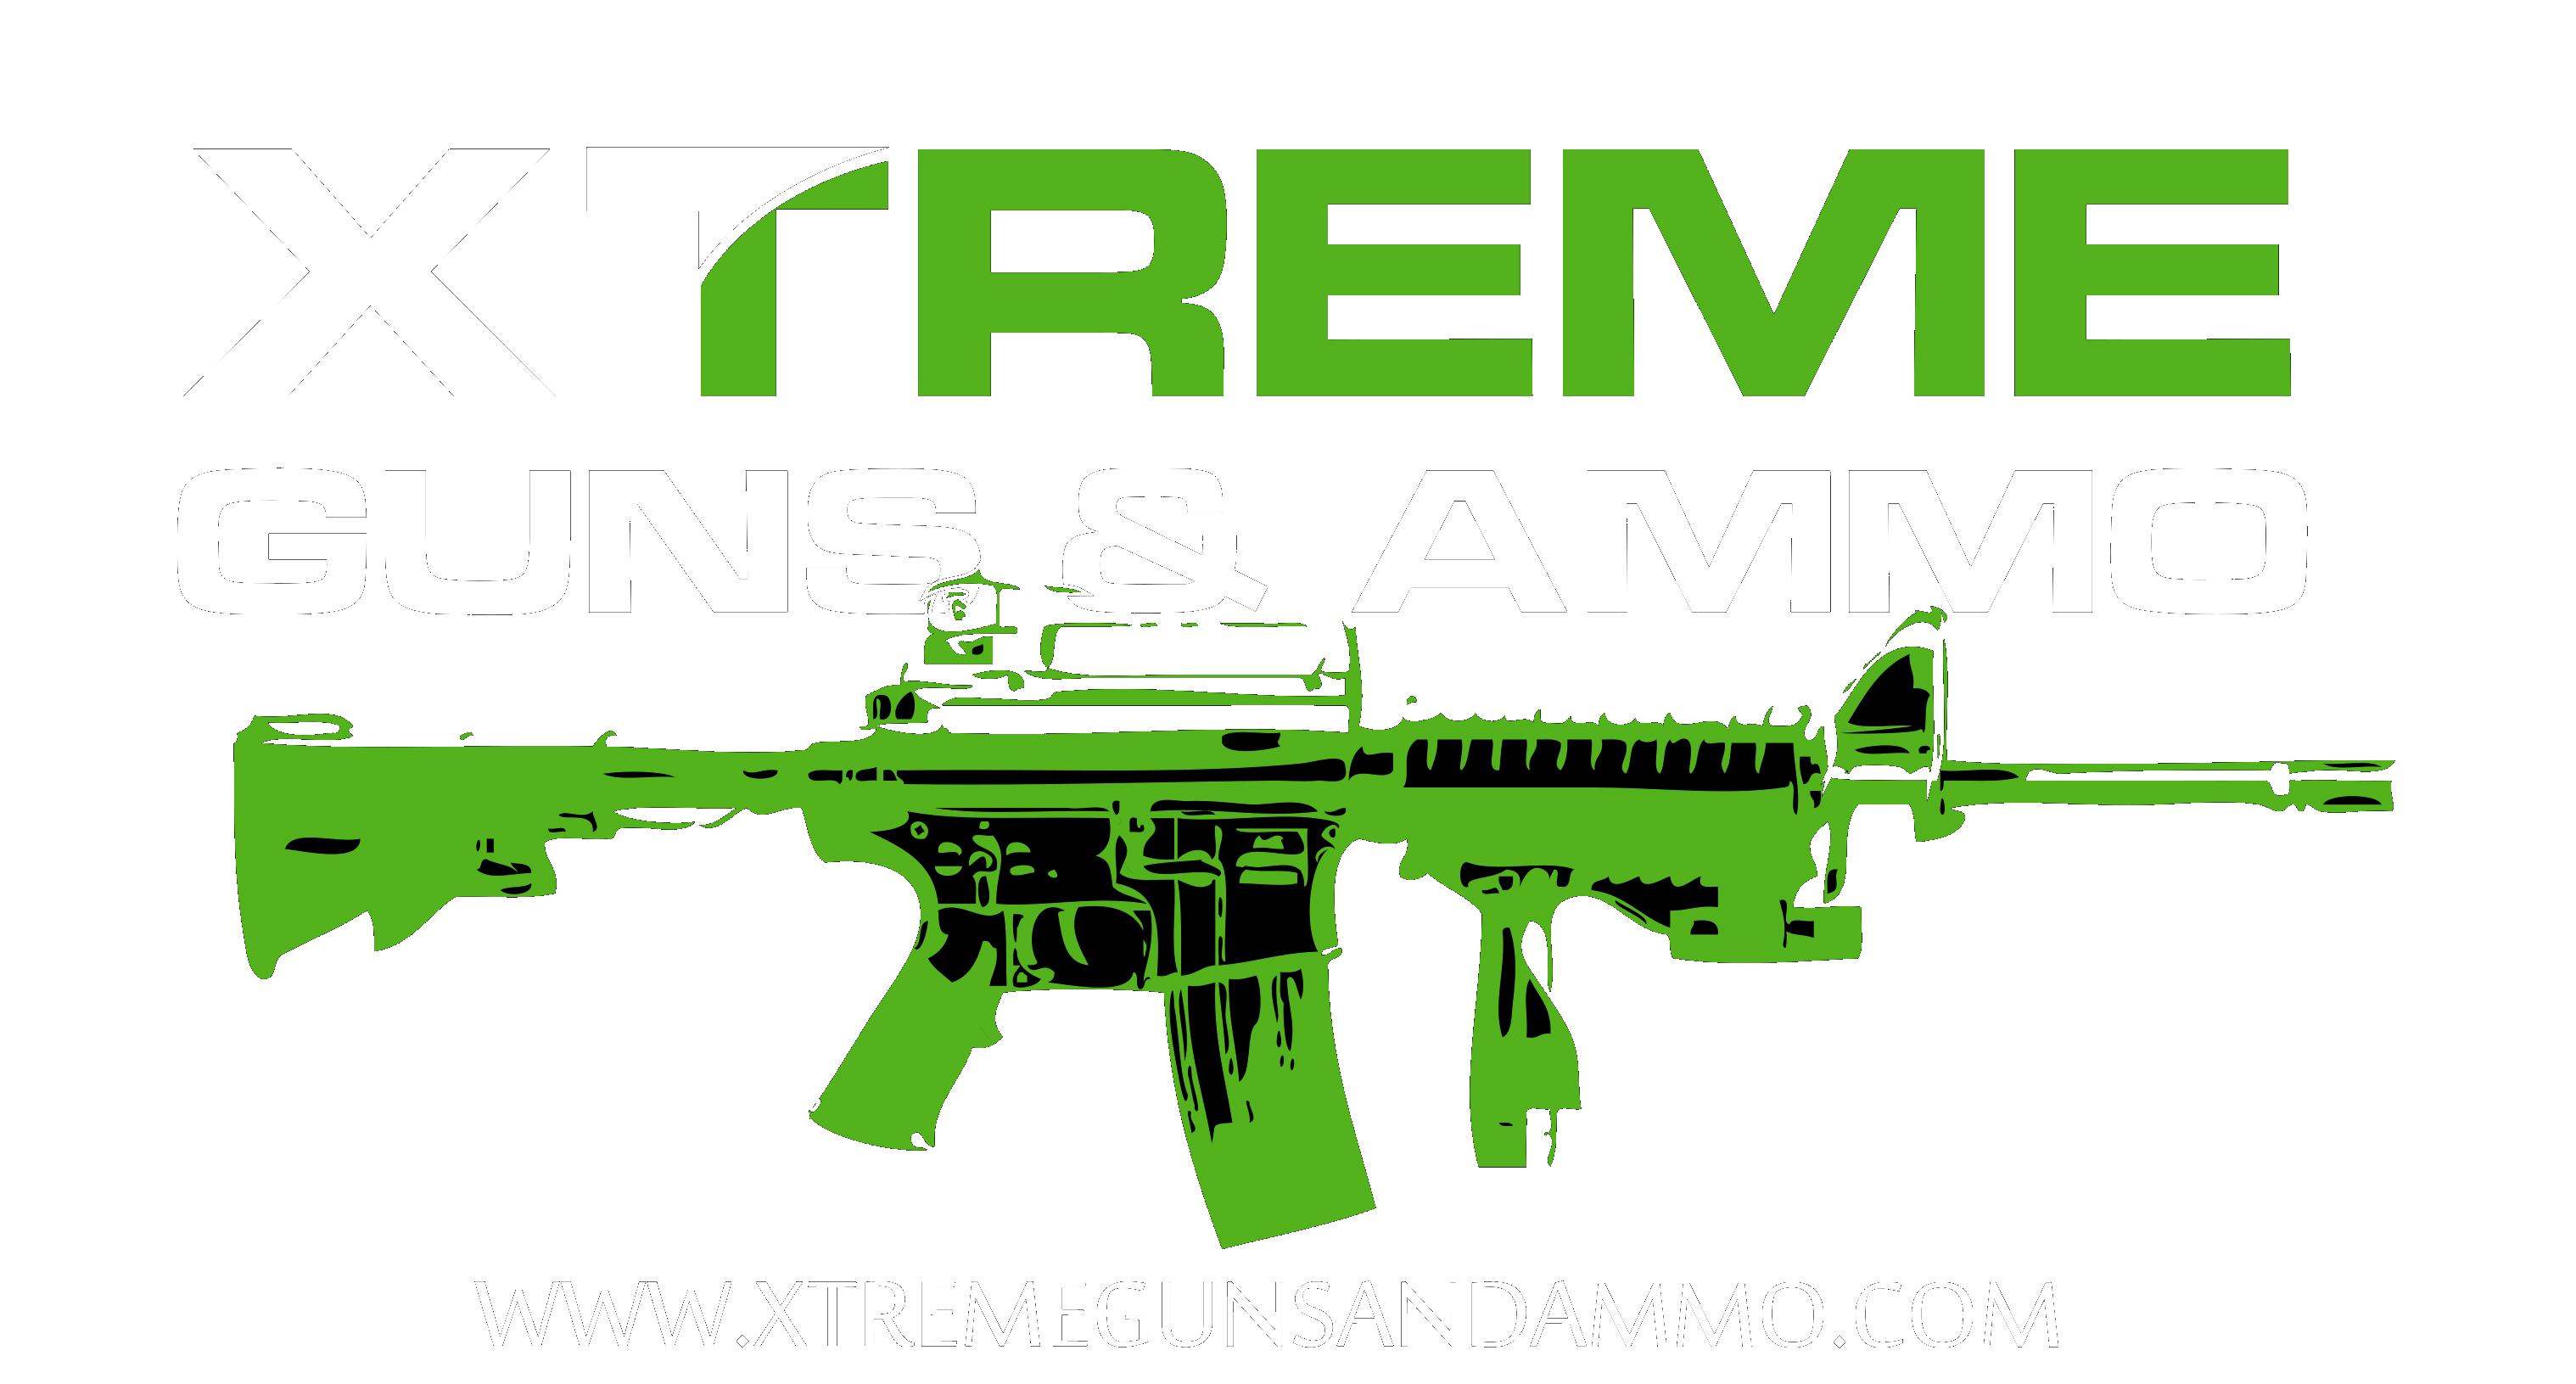 Xtreme Guns & Ammo